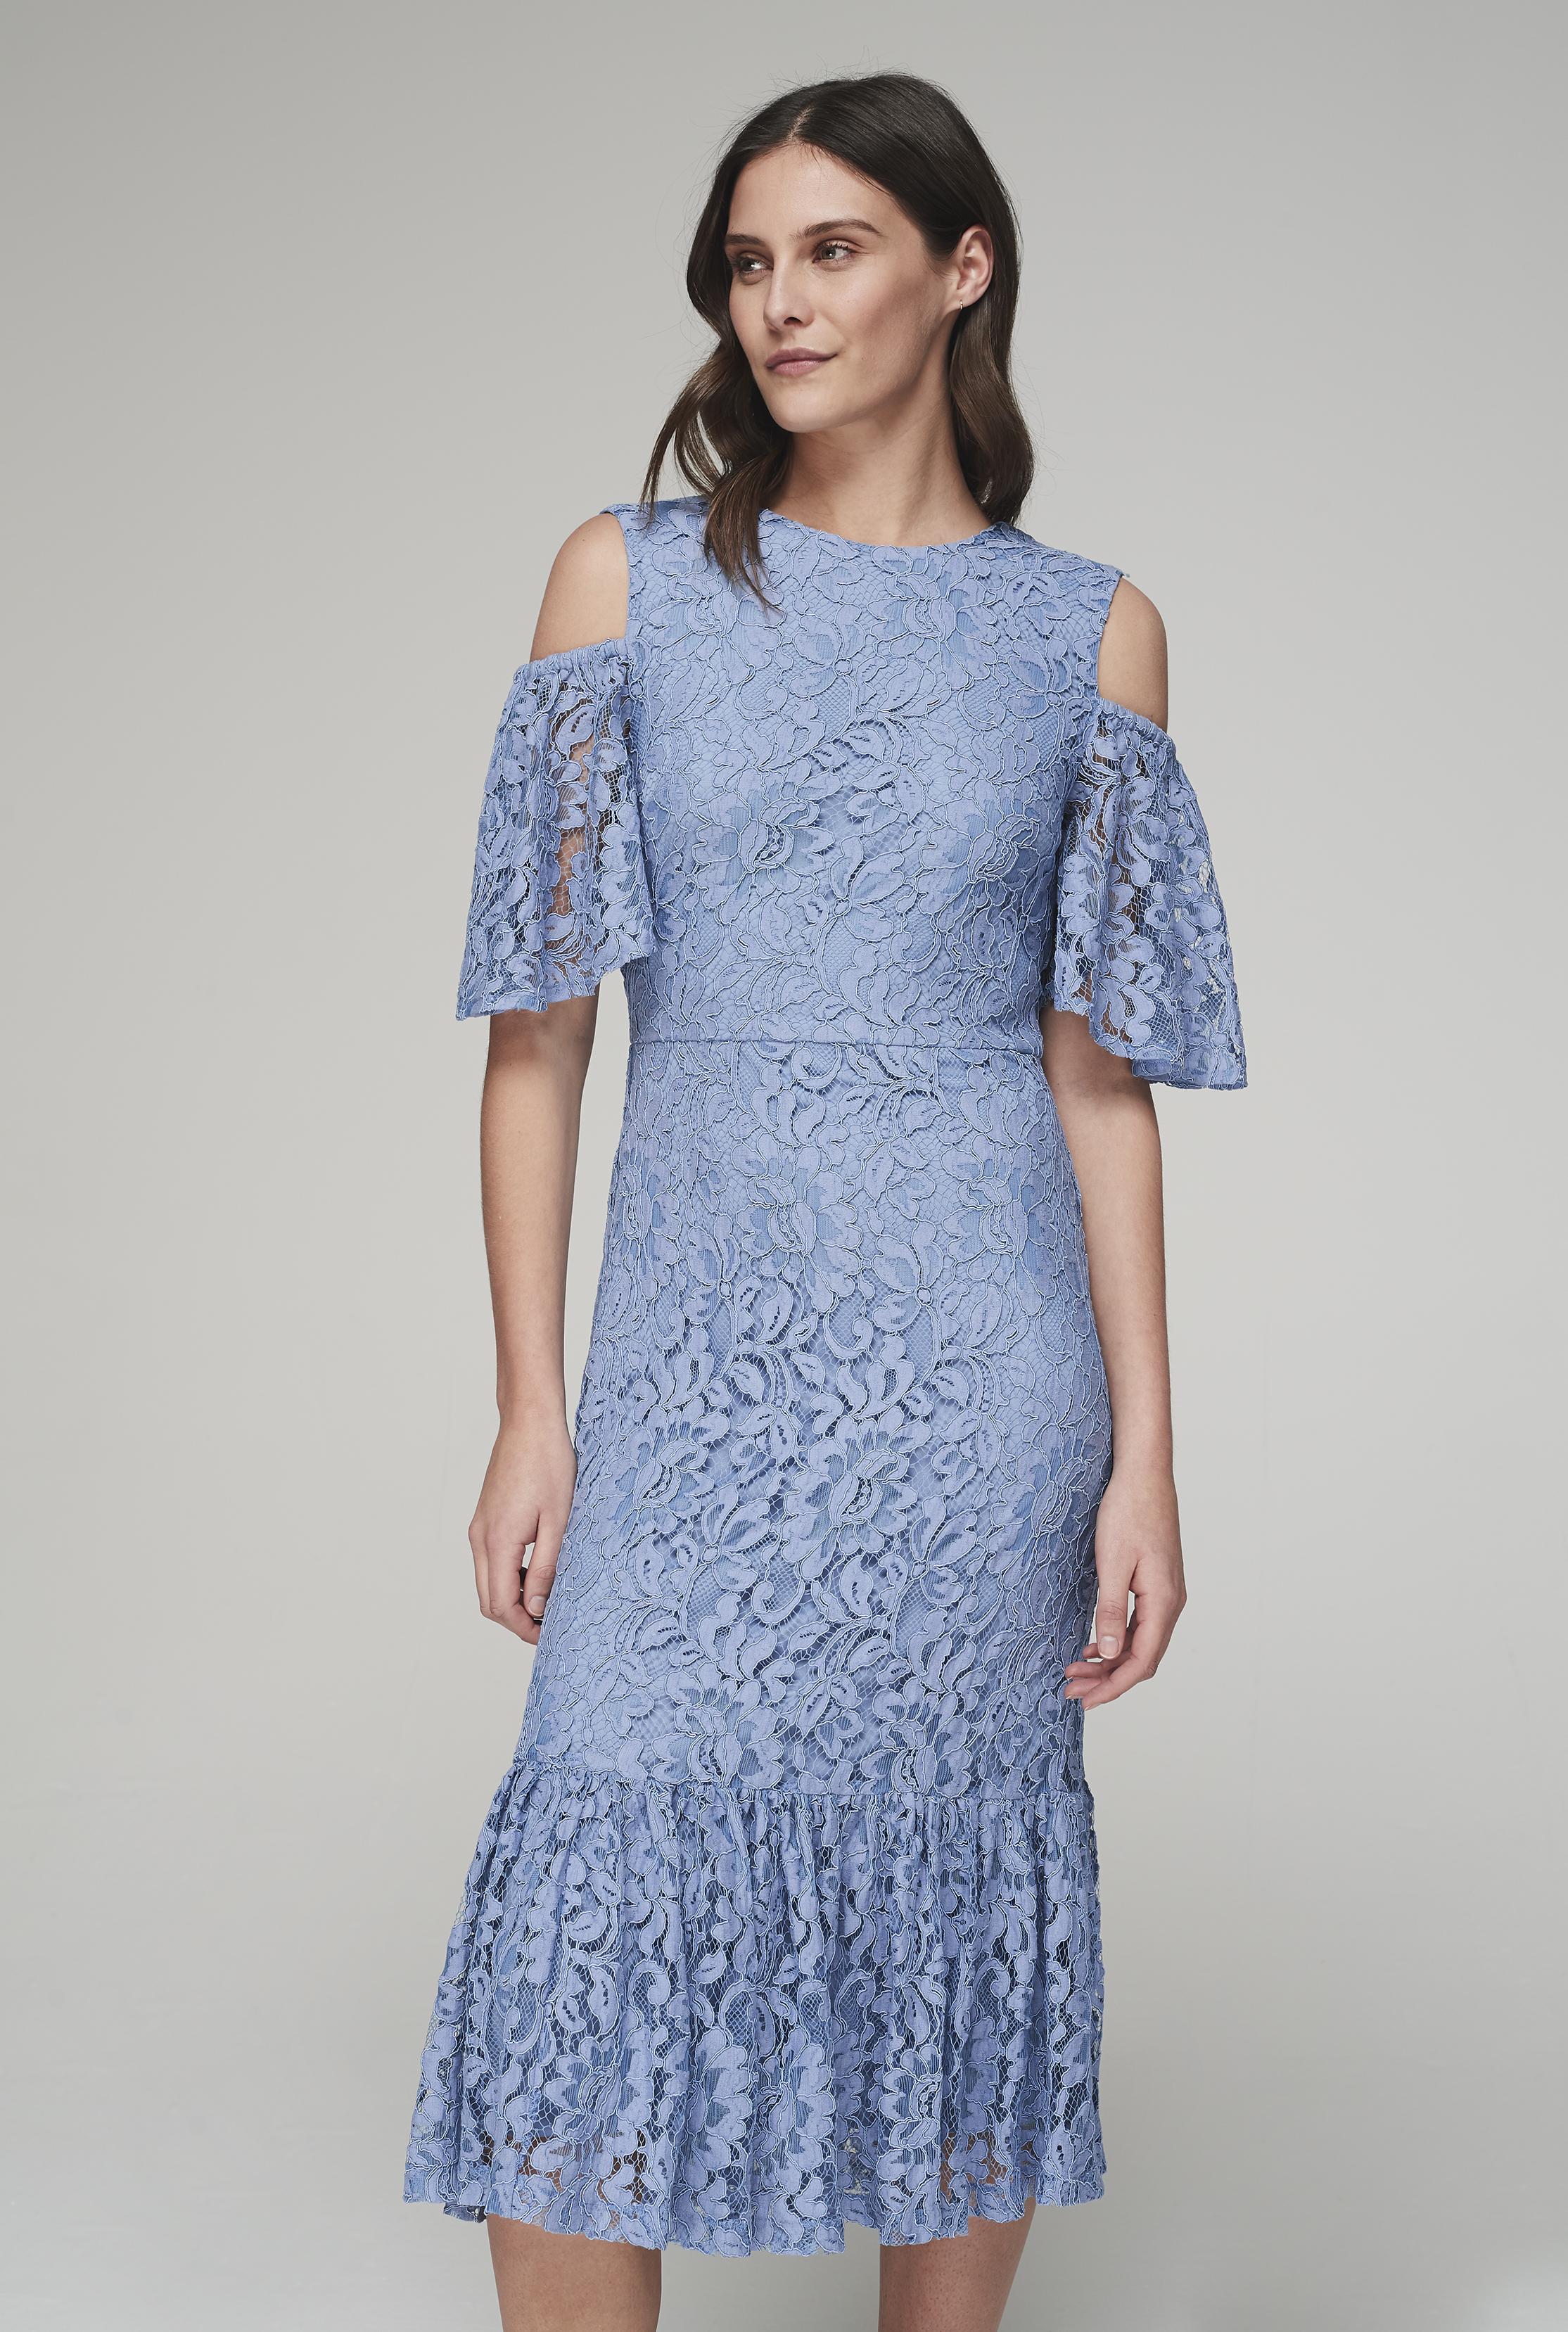 Y.A.S Tall Powder Blue Radic Lace Dress